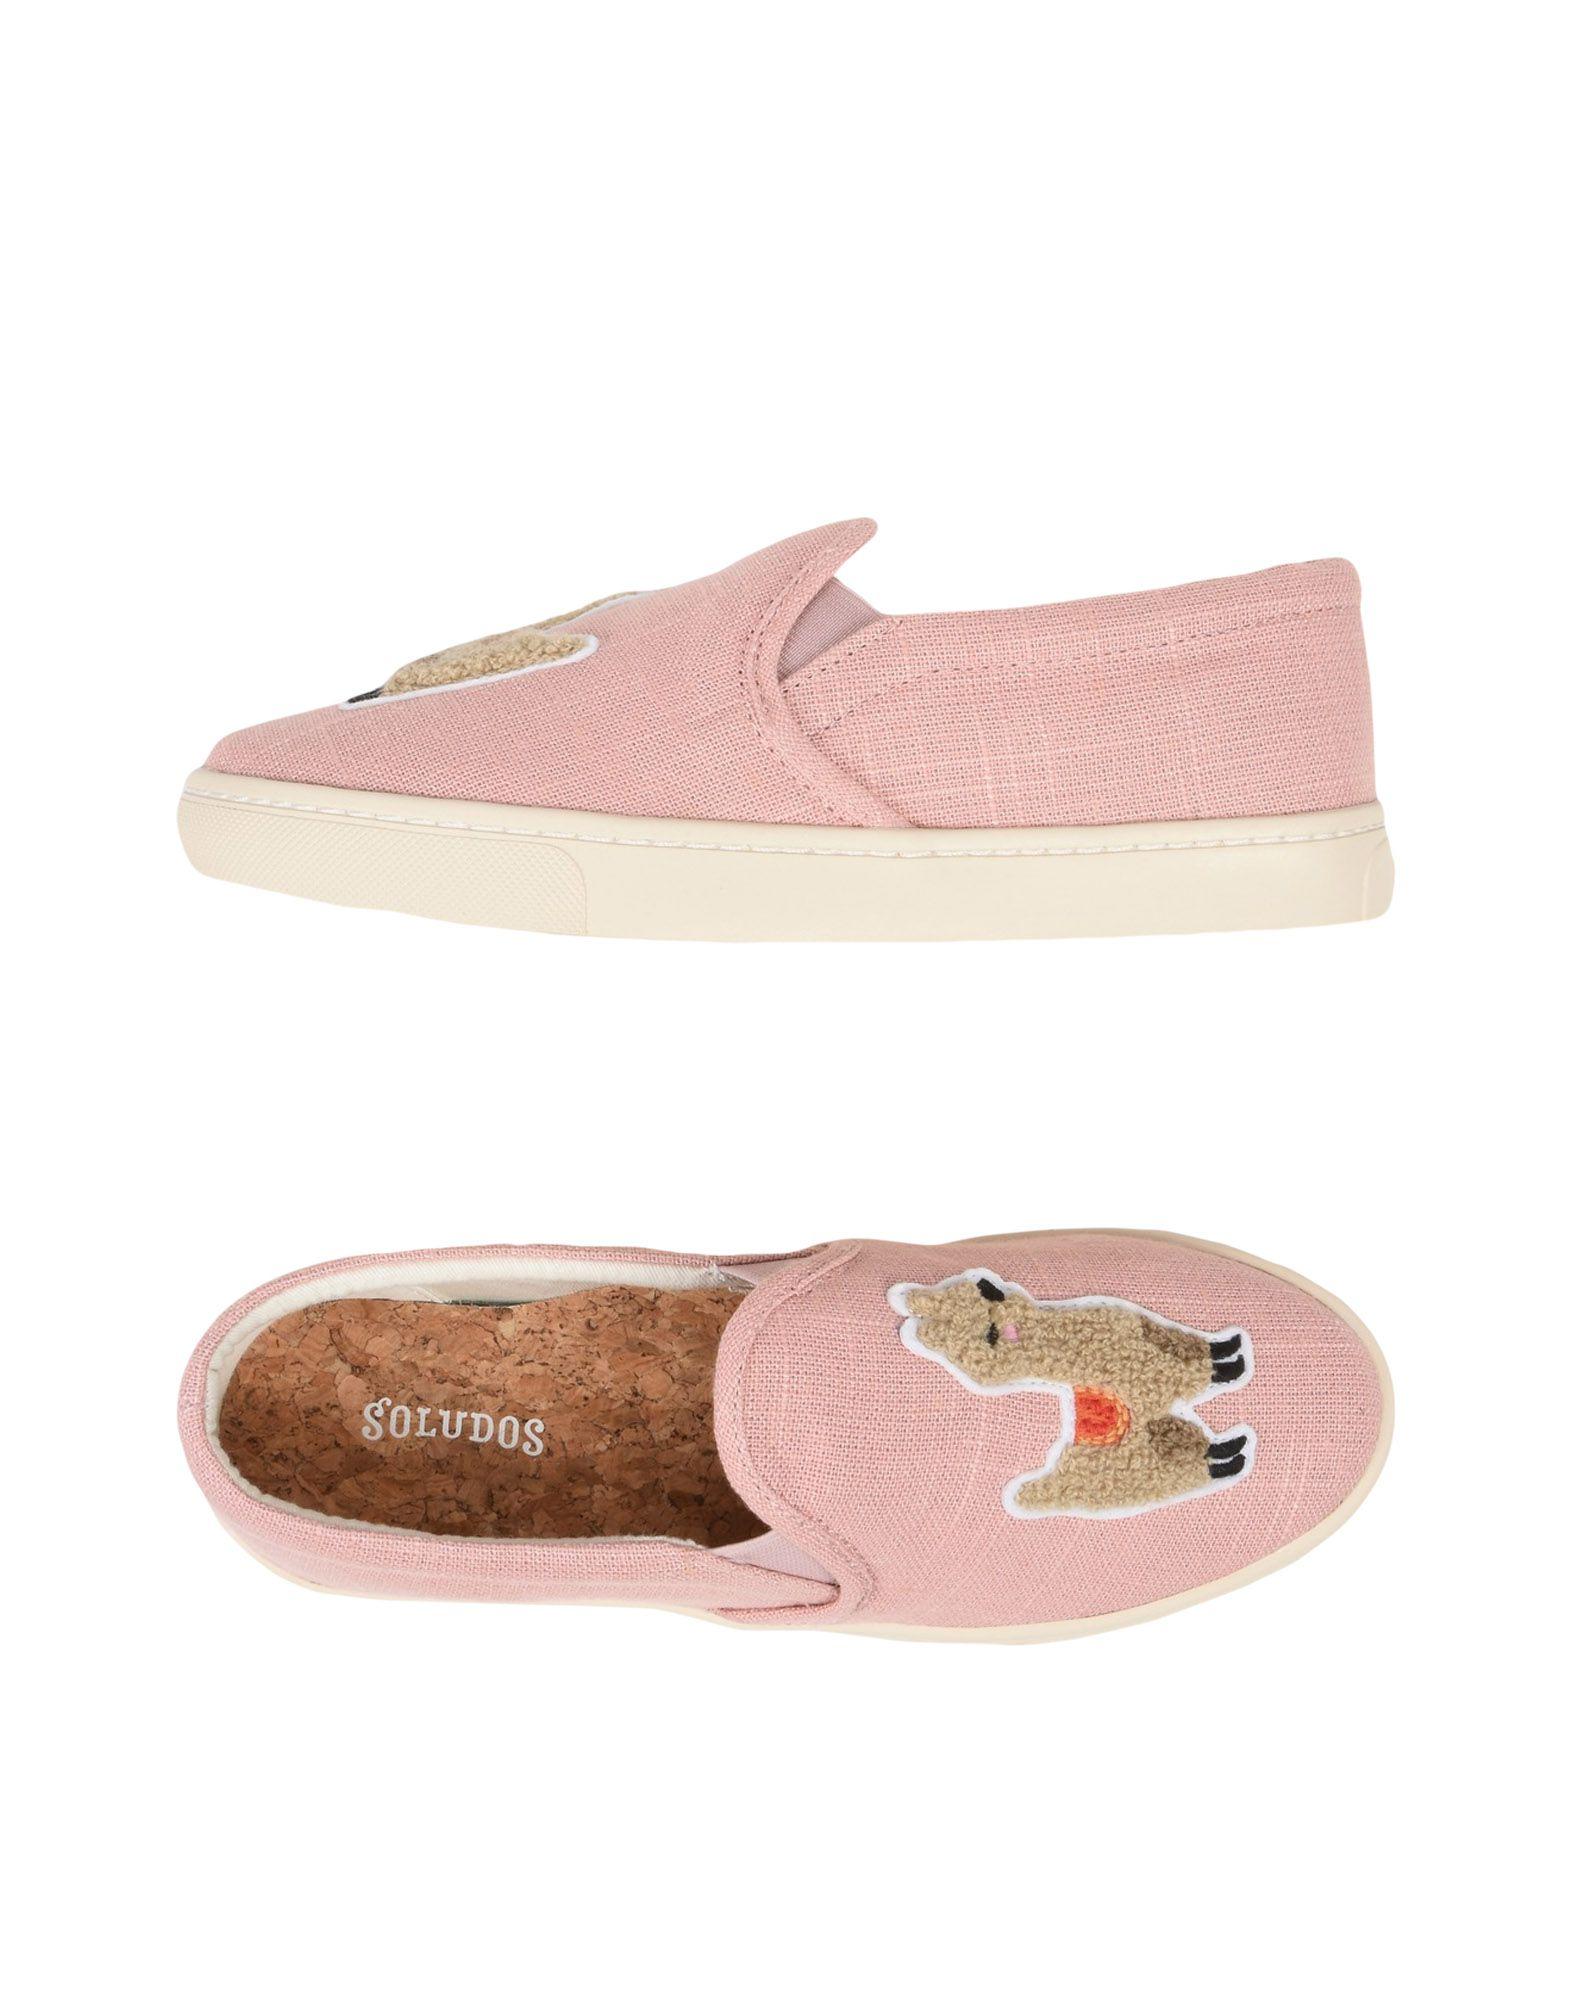 Soludos Llama Slip On Sneaker Qualität  11477843VG Gute Qualität Sneaker beliebte Schuhe fb8ae4